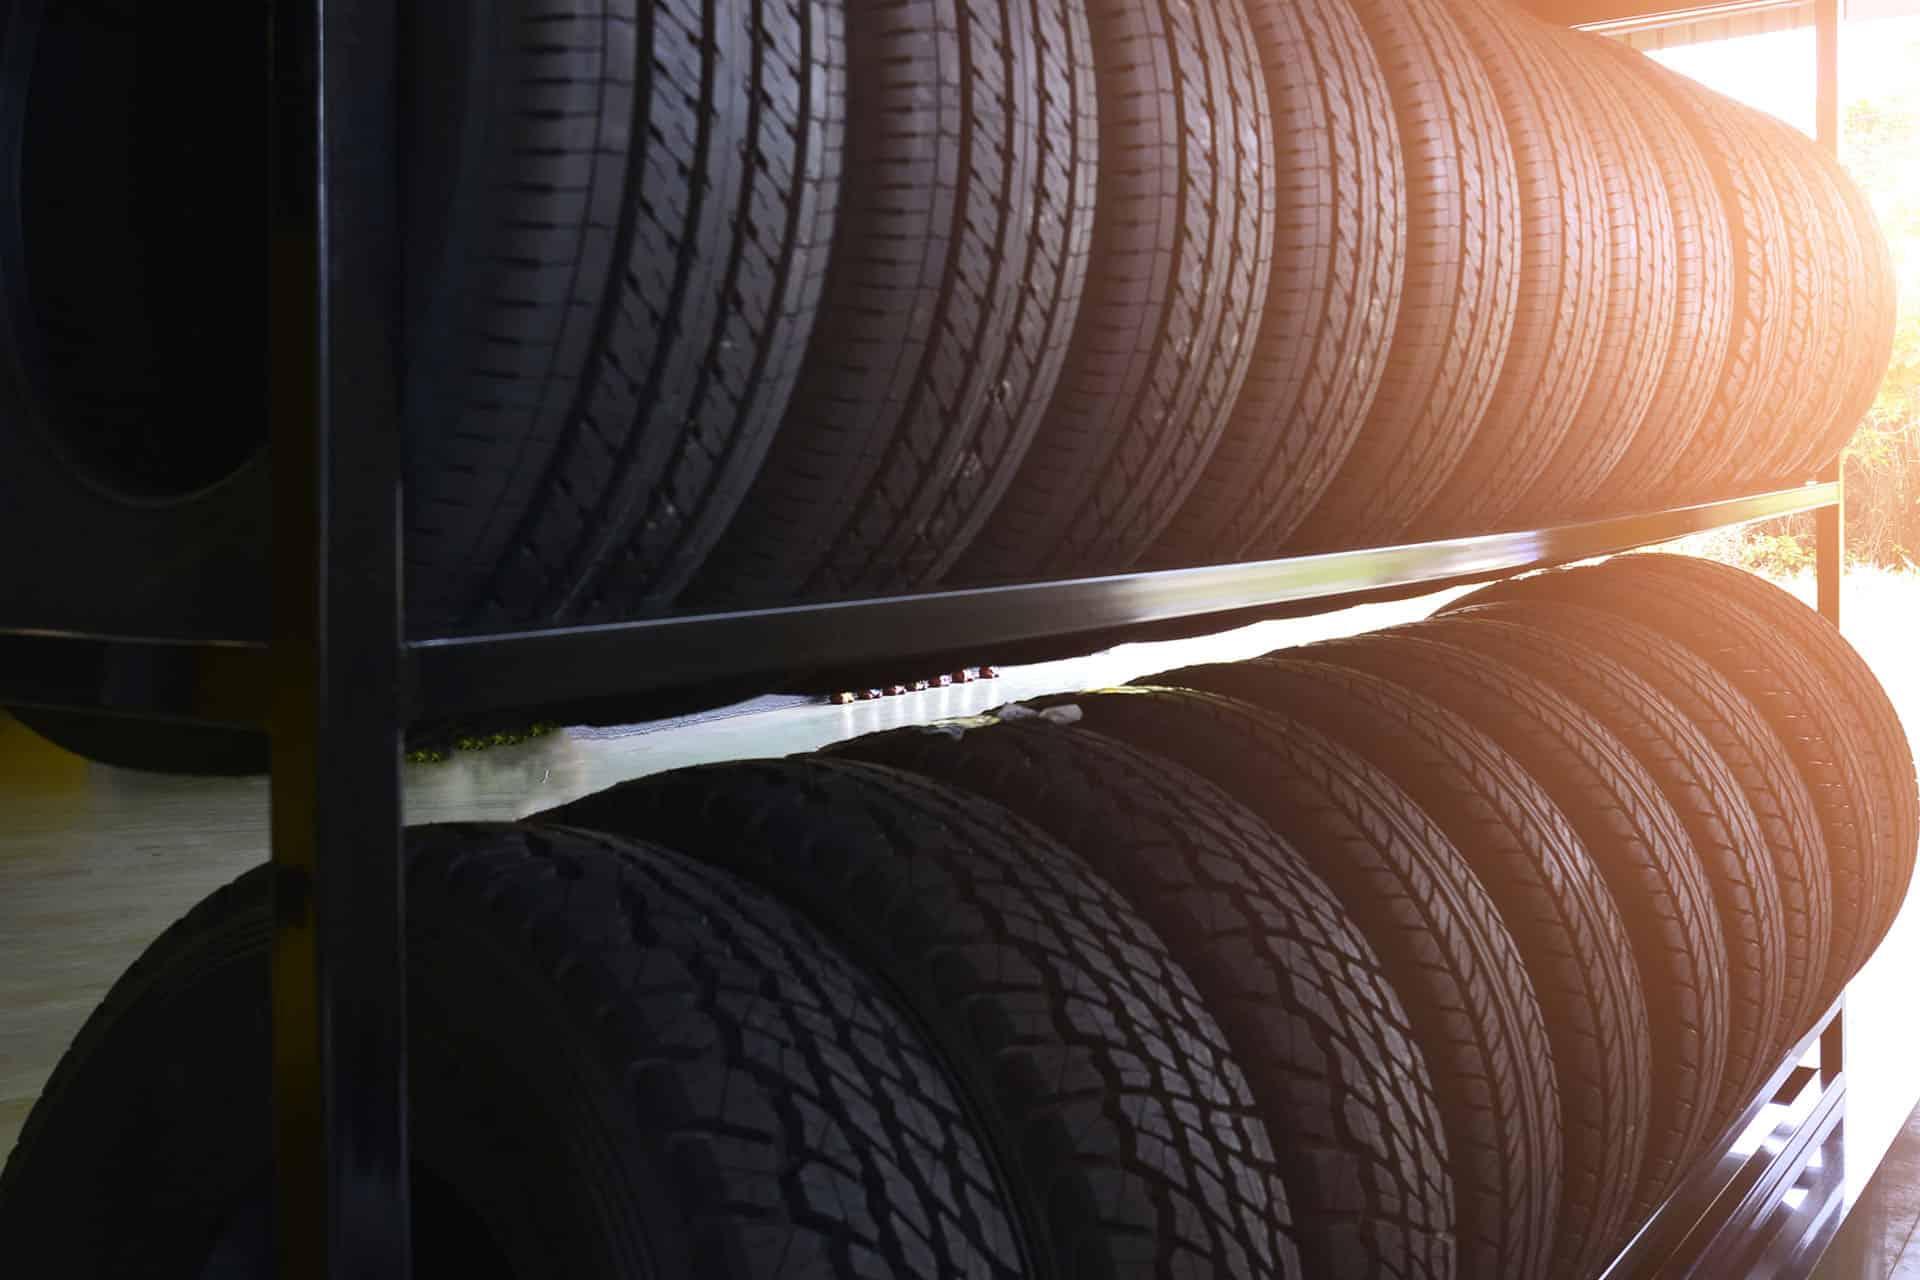 officina, gommista con deposito pneumatici, auto sostitutiva